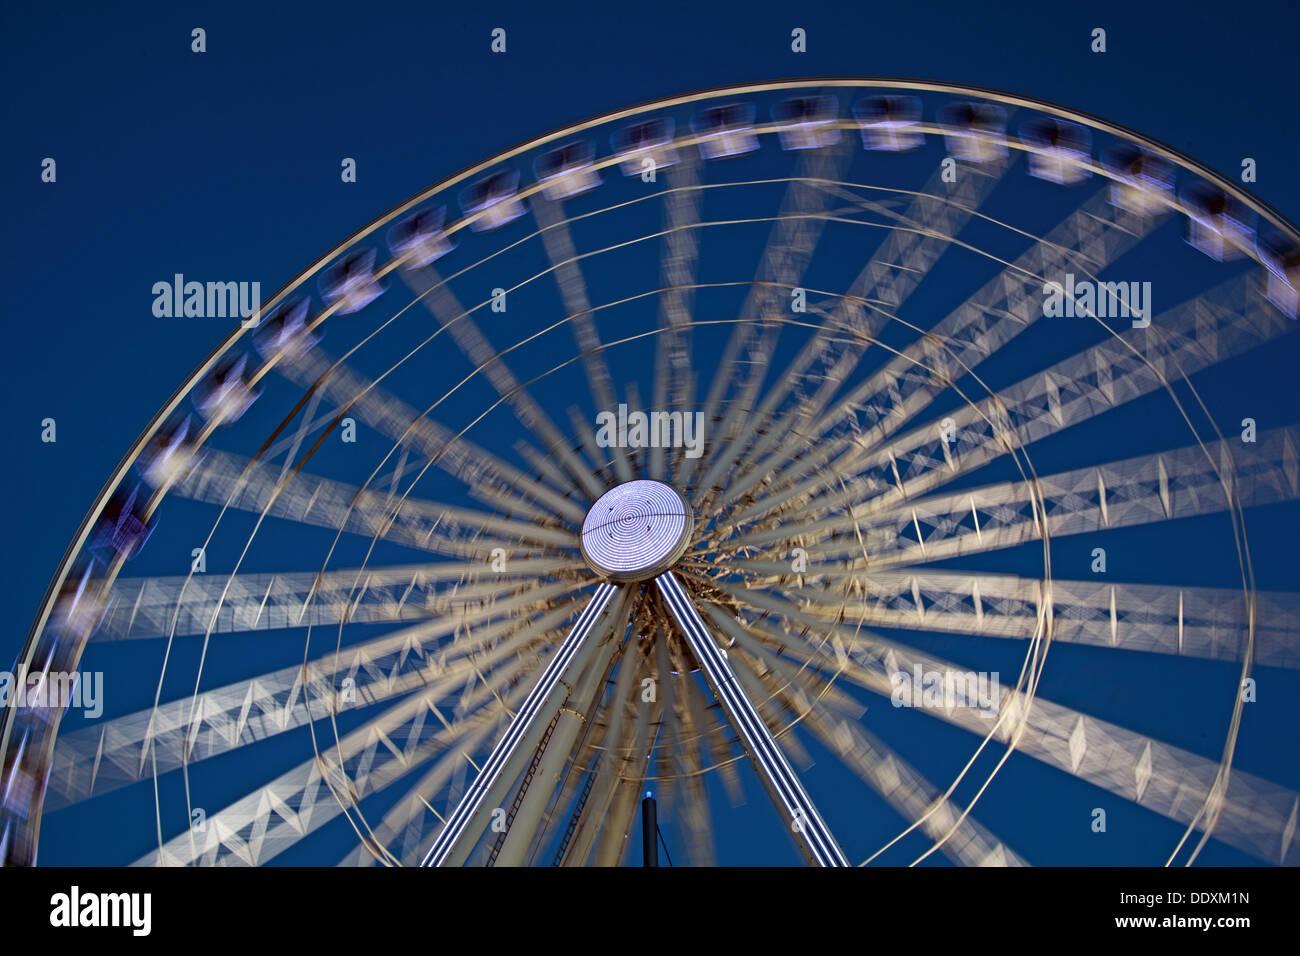 Pier Head Albert Dock at Nighttime liverpool Merseyside England UK Stock Photo